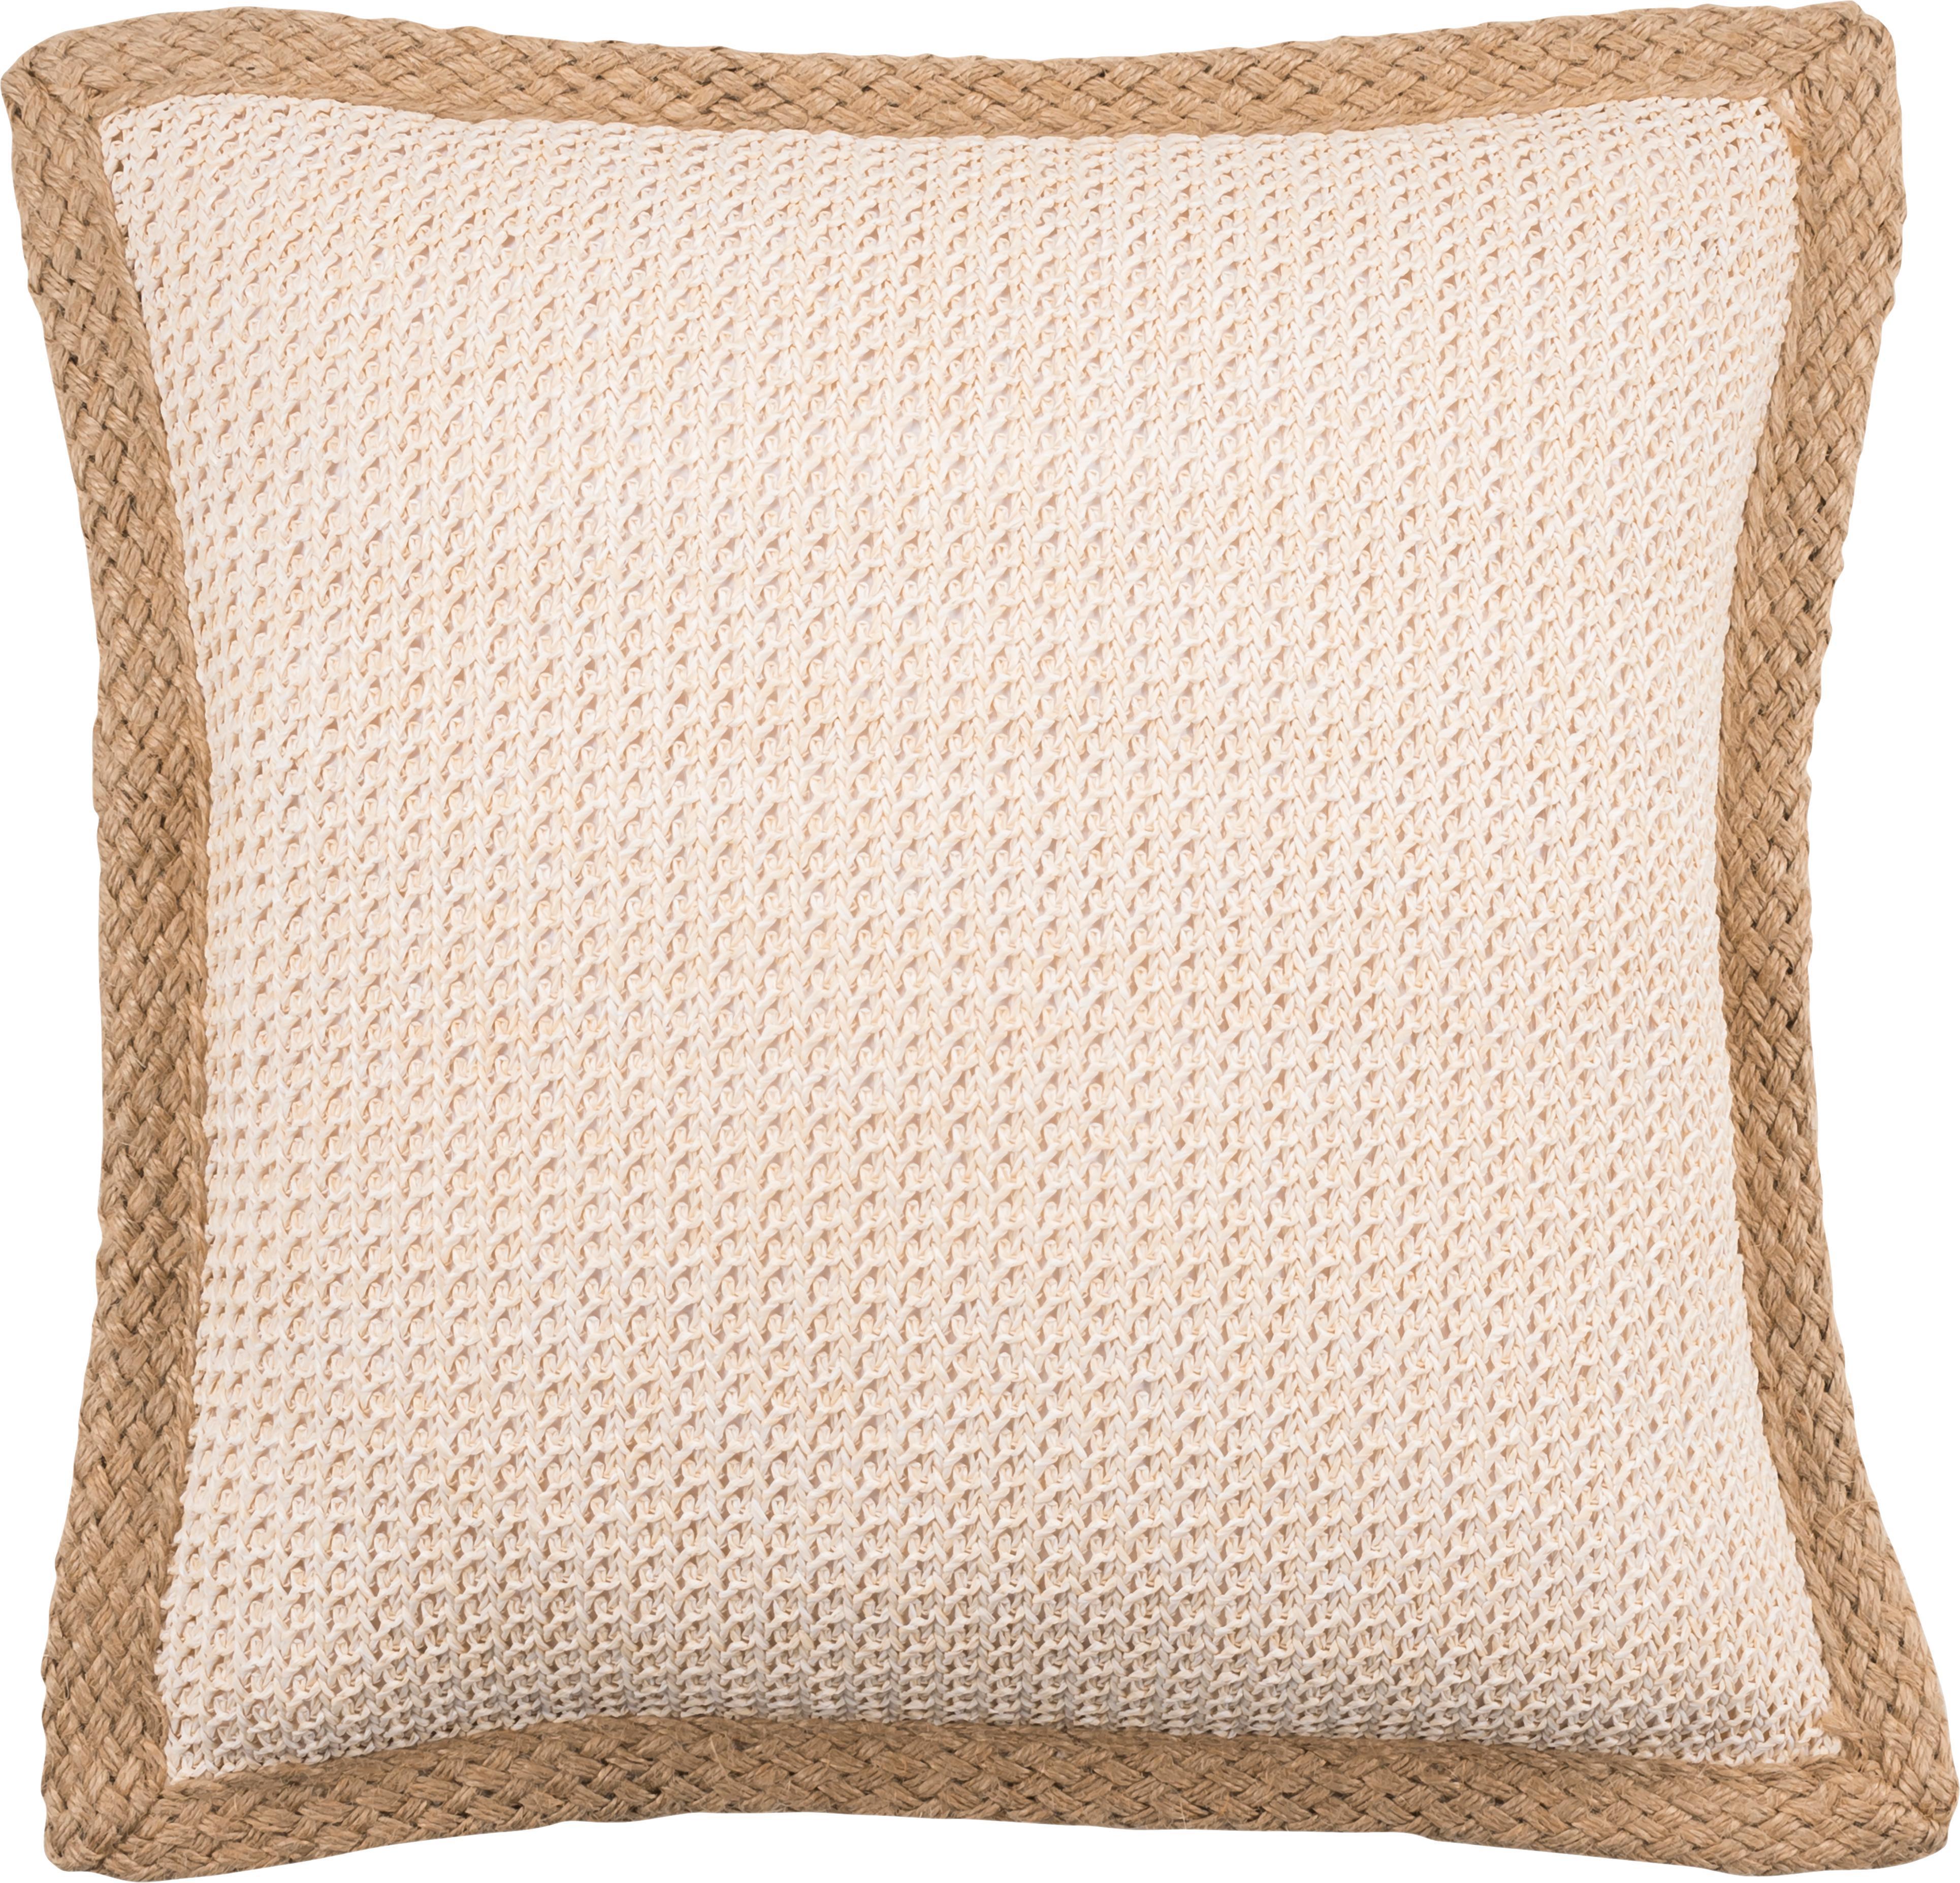 Funda de cojín con ribete de yute Tally, 50%yute, 50%algodón, Blanco, beige, An 45 x L 45 cm